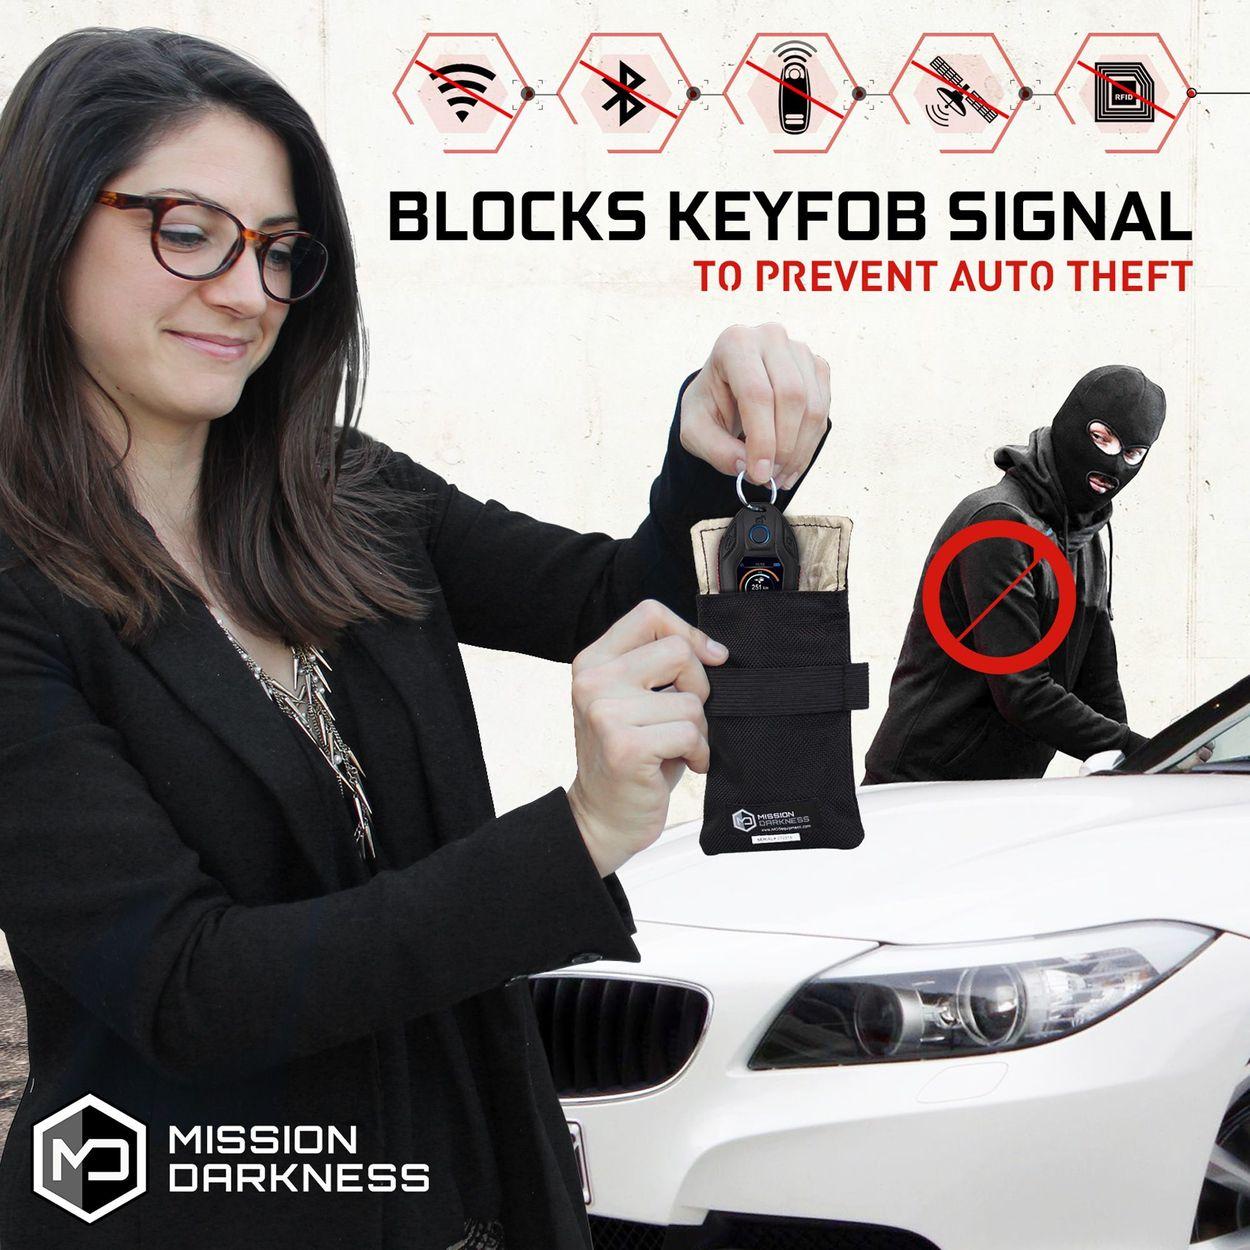 Blocks Keyfob signal, to prevent auto theft.